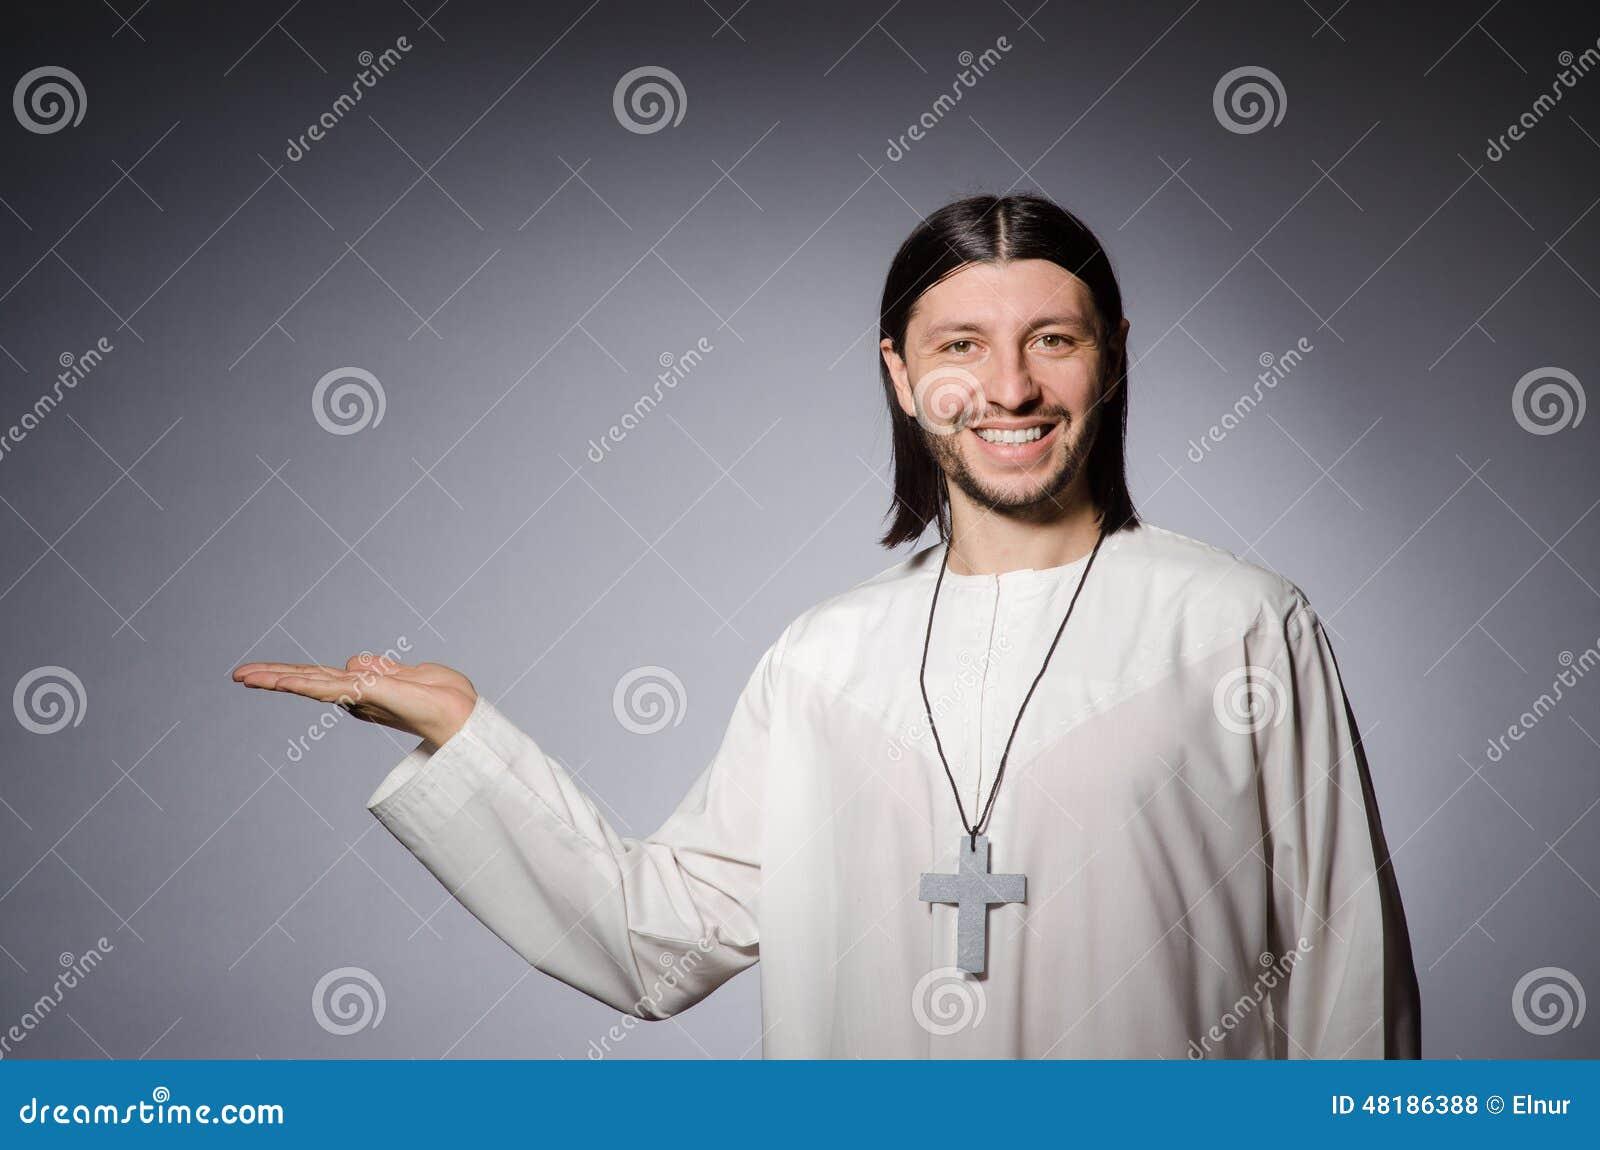 Priest man in religious